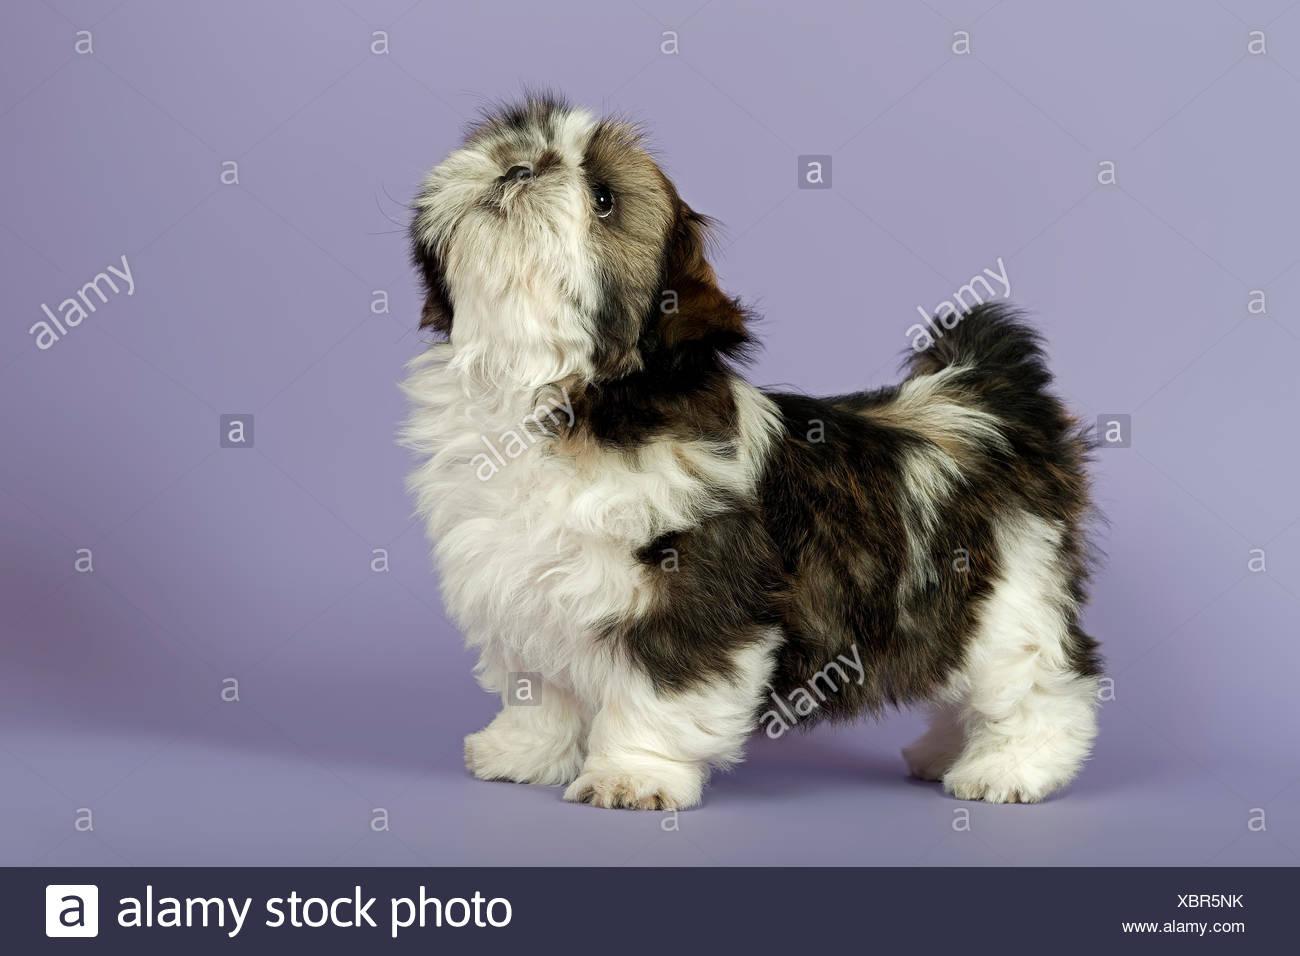 Shih Tzu Puppy 10 Weeks Gold White Stock Photo 282636527 Alamy